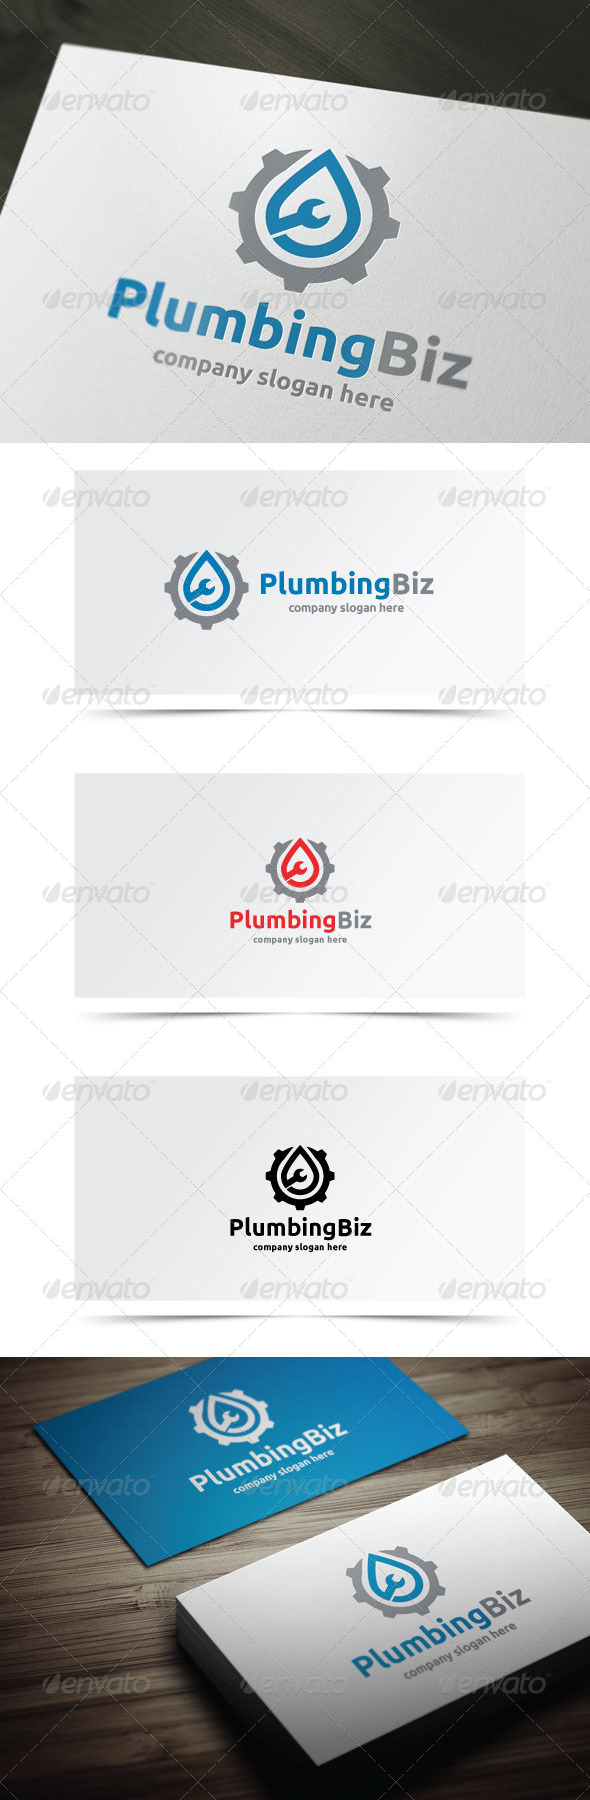 Plumbing Biz